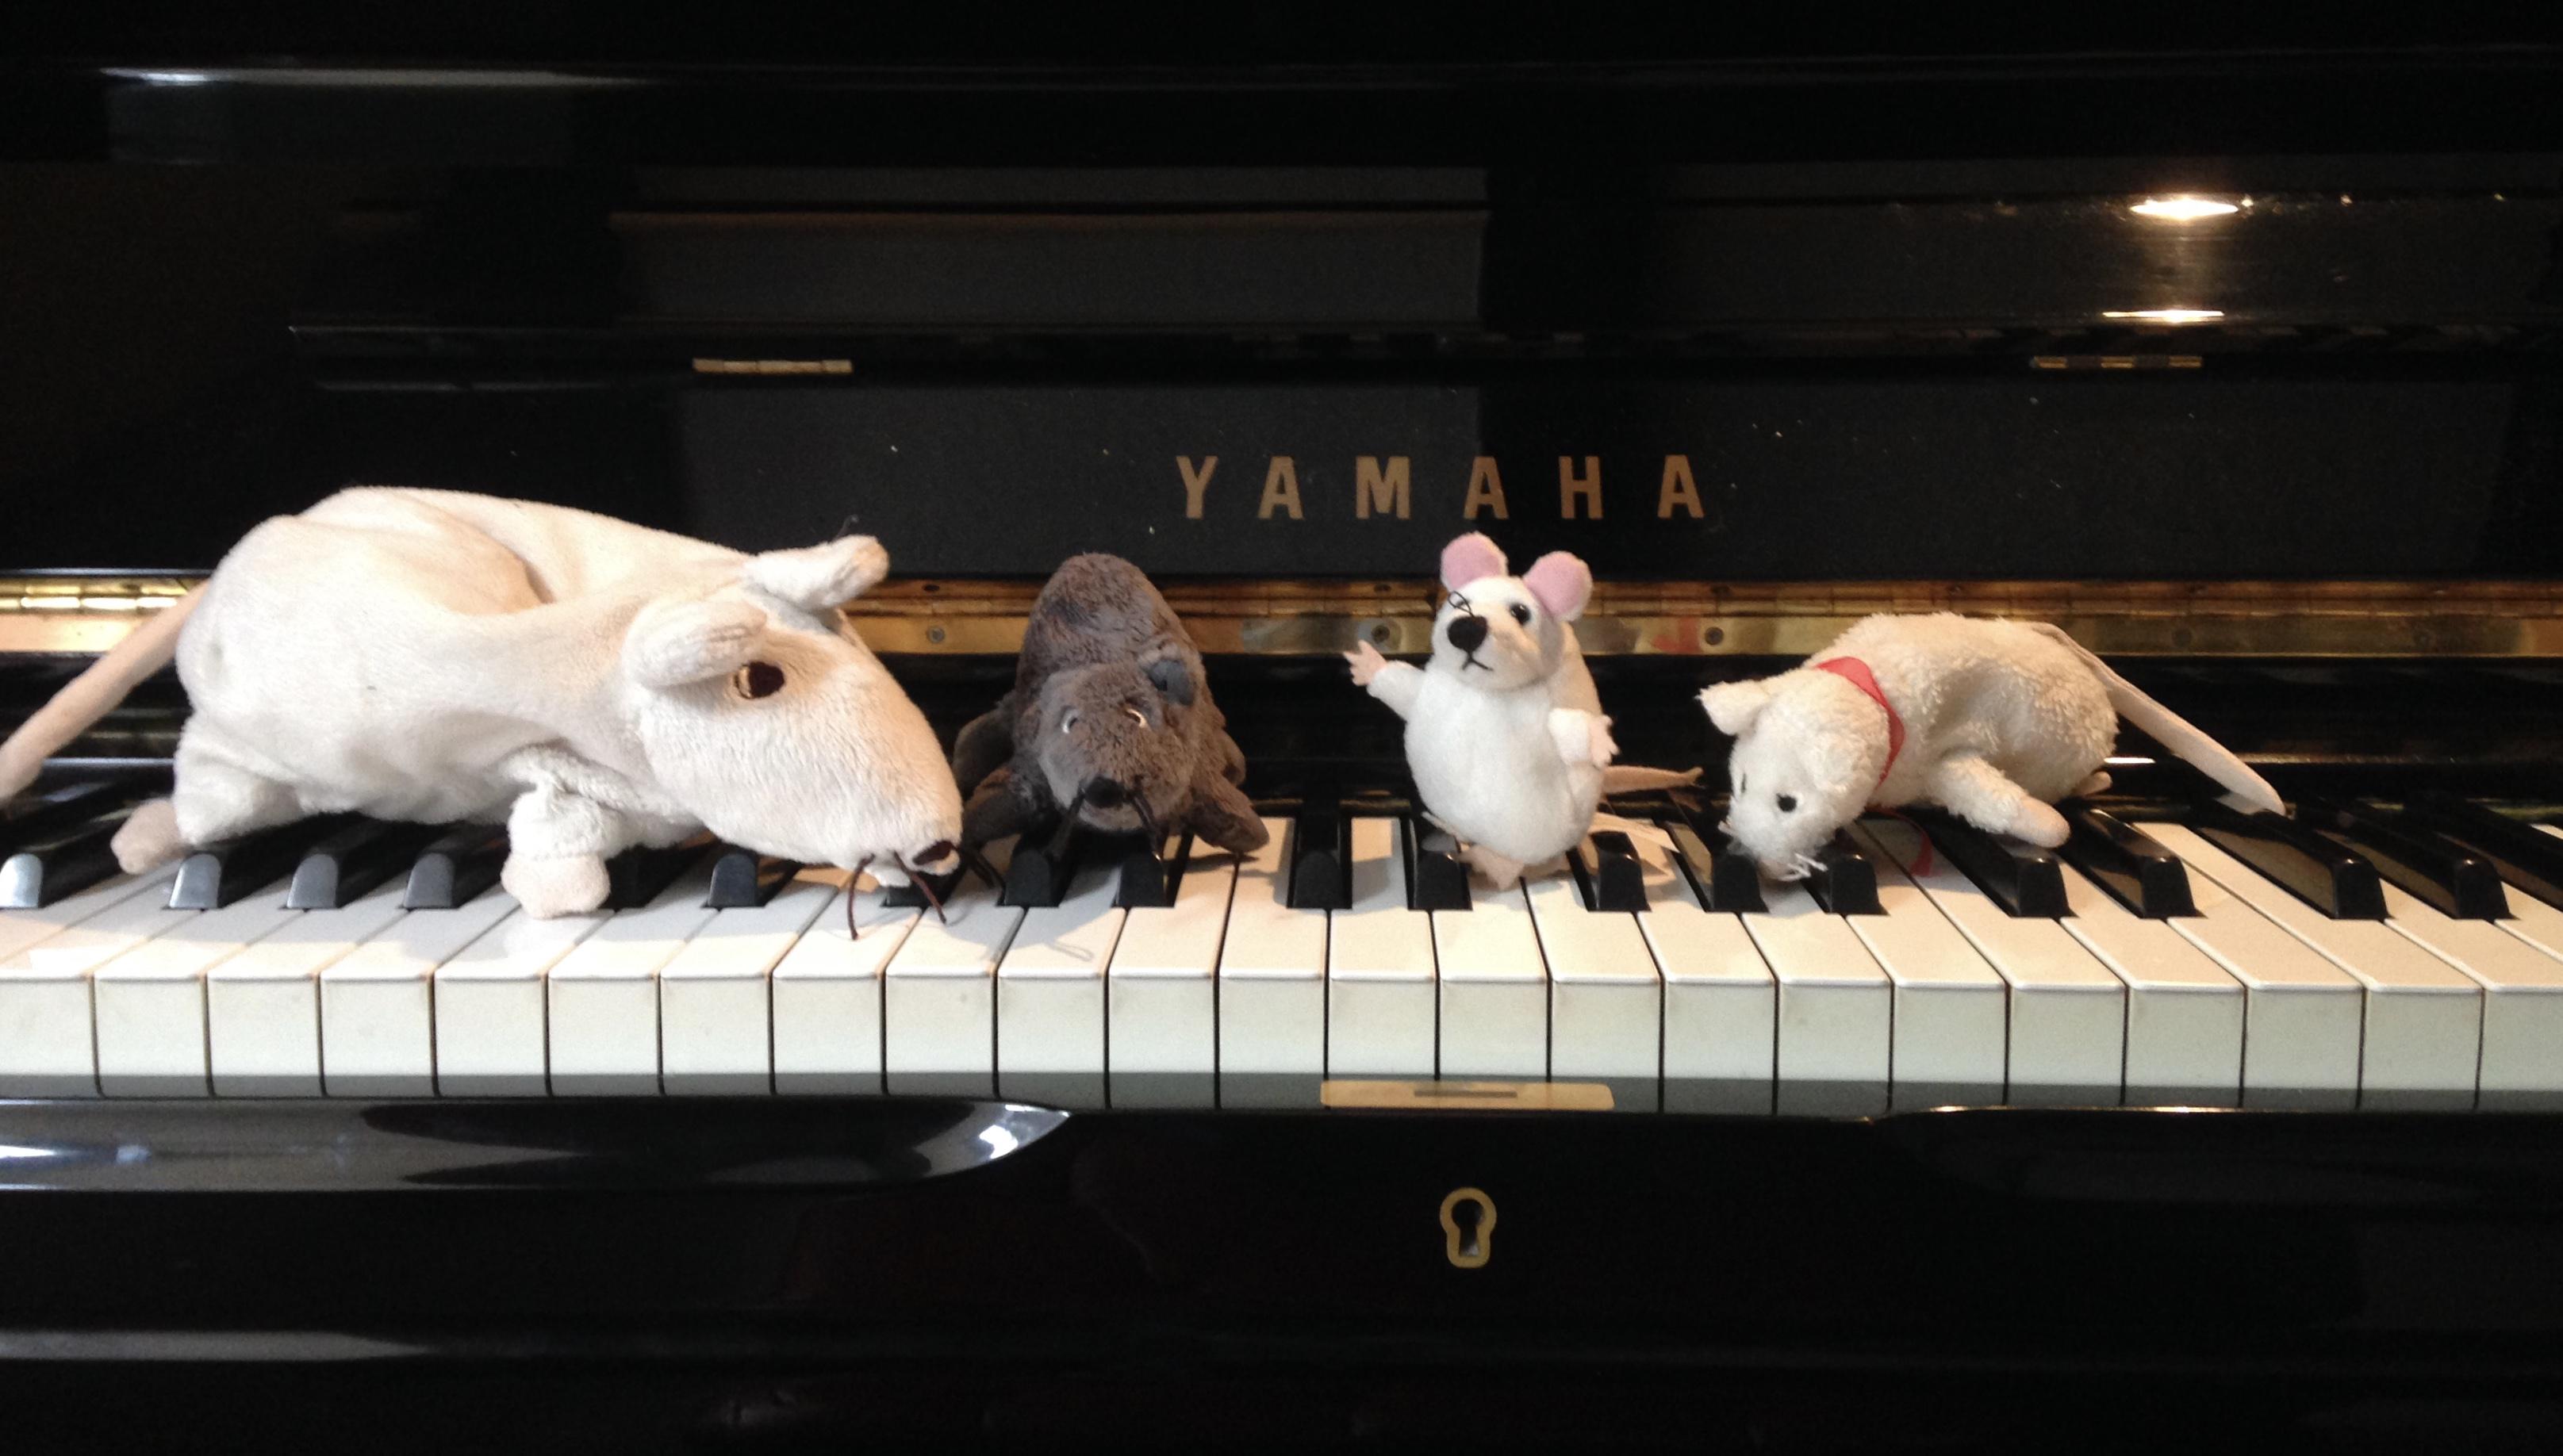 The Talking Mice